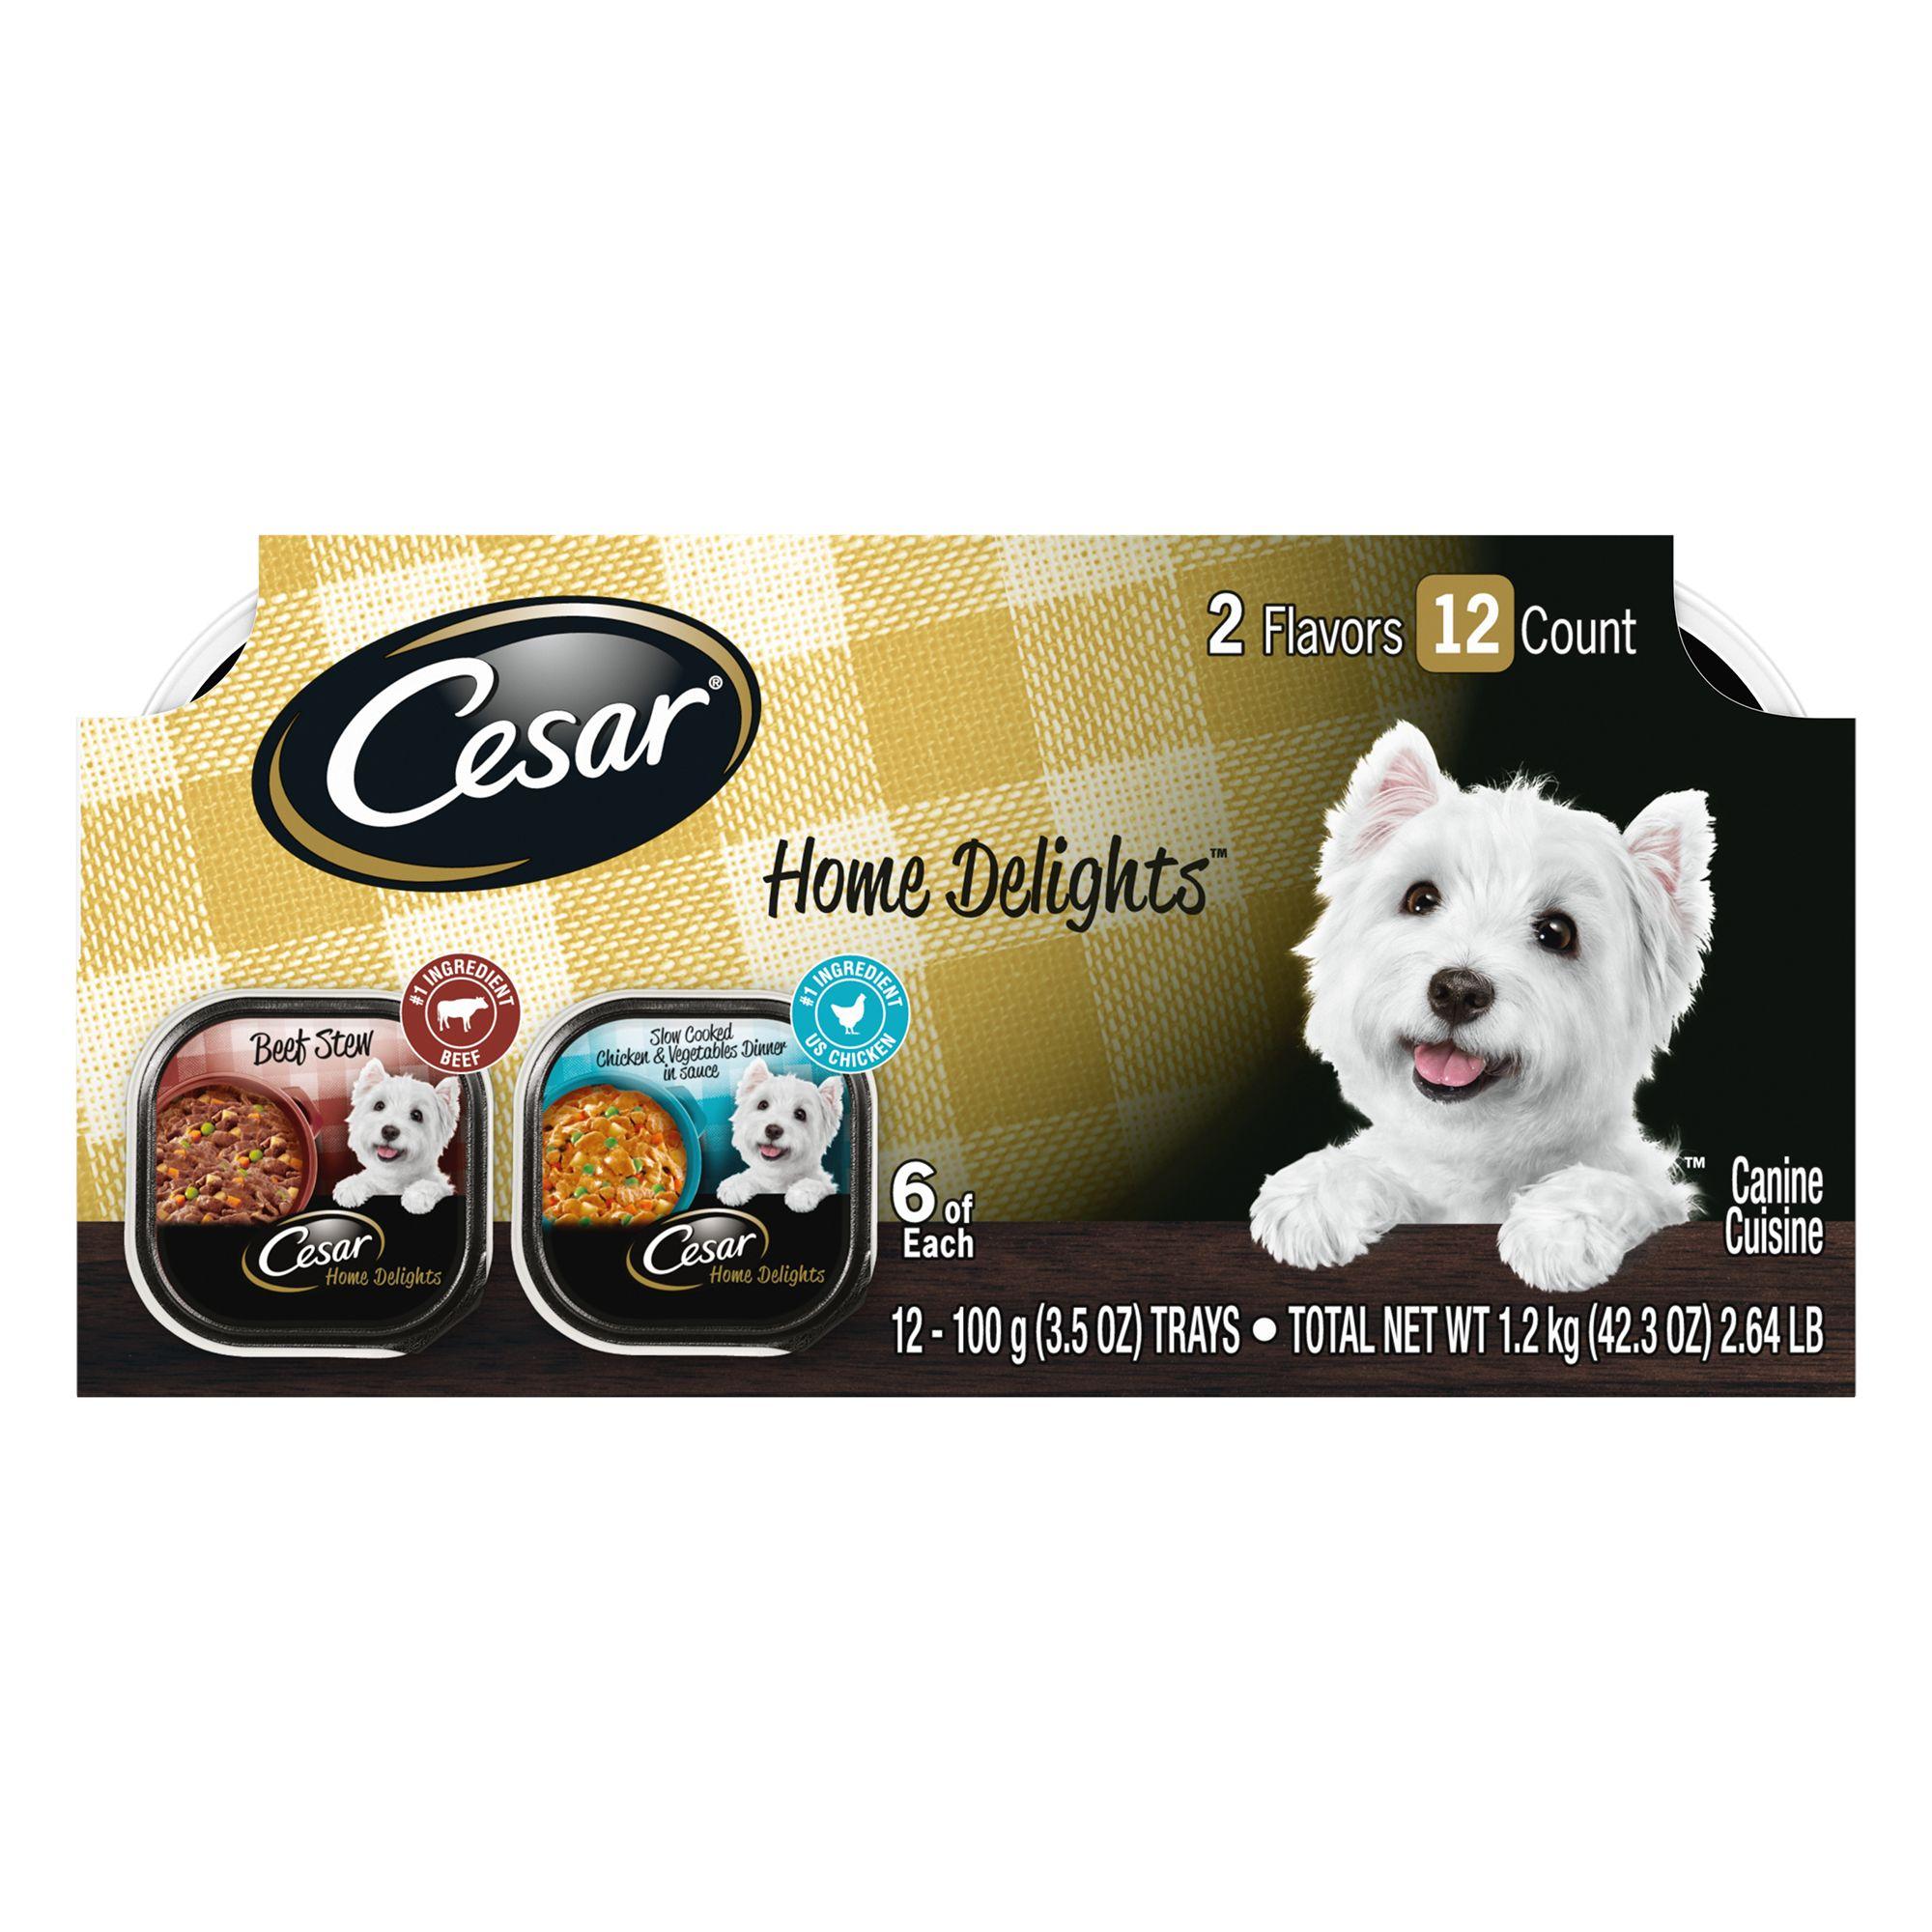 Cesar Home Delights Variety Pack Dog Food Size 3.5 Oz